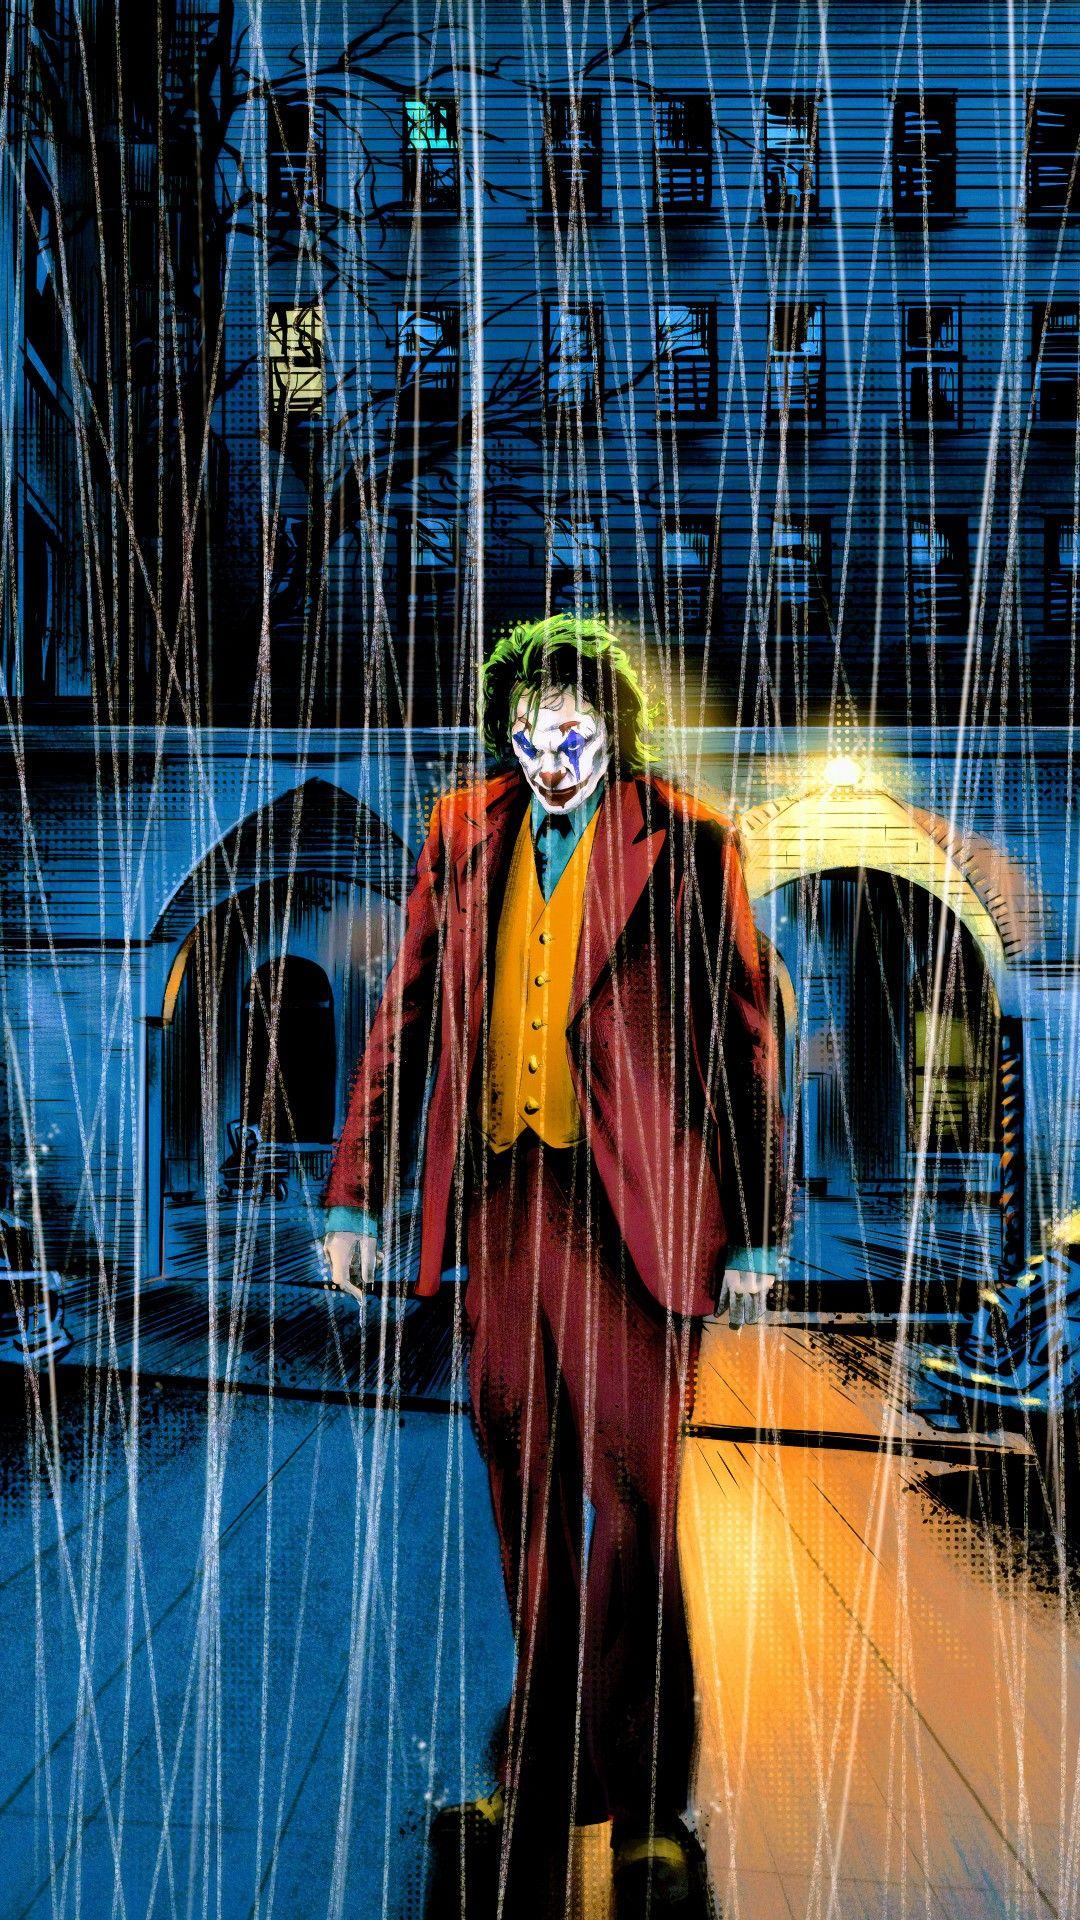 Joker Joaquin Phoenix Joker Hd Wallpaper Joker Poster Joker Dc